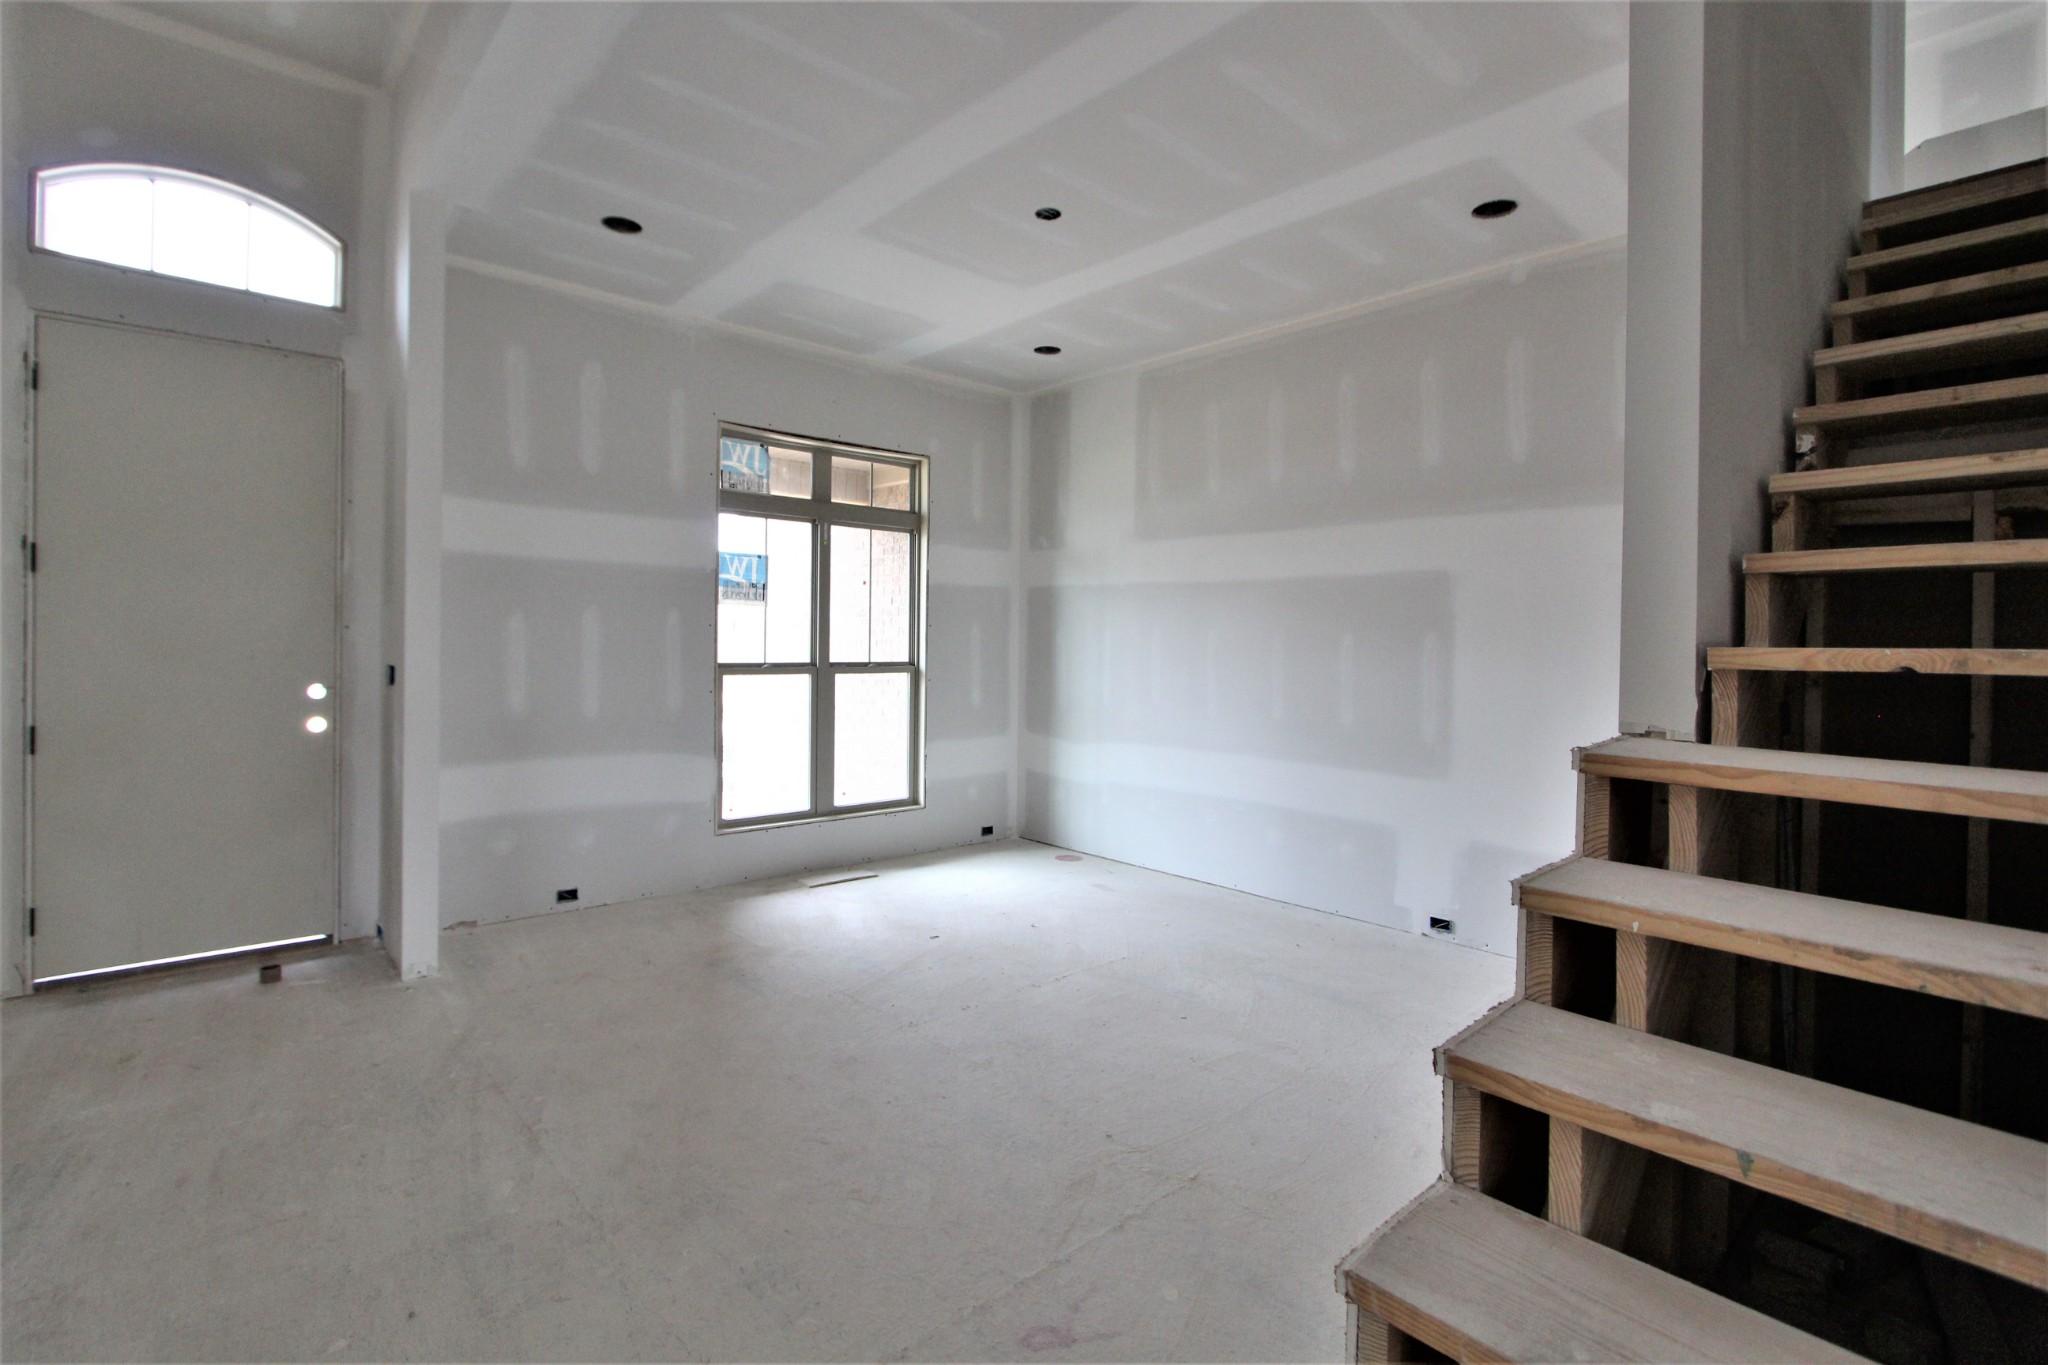 202 Whitley Way #202, Mount Juliet, TN 37122 - Mount Juliet, TN real estate listing